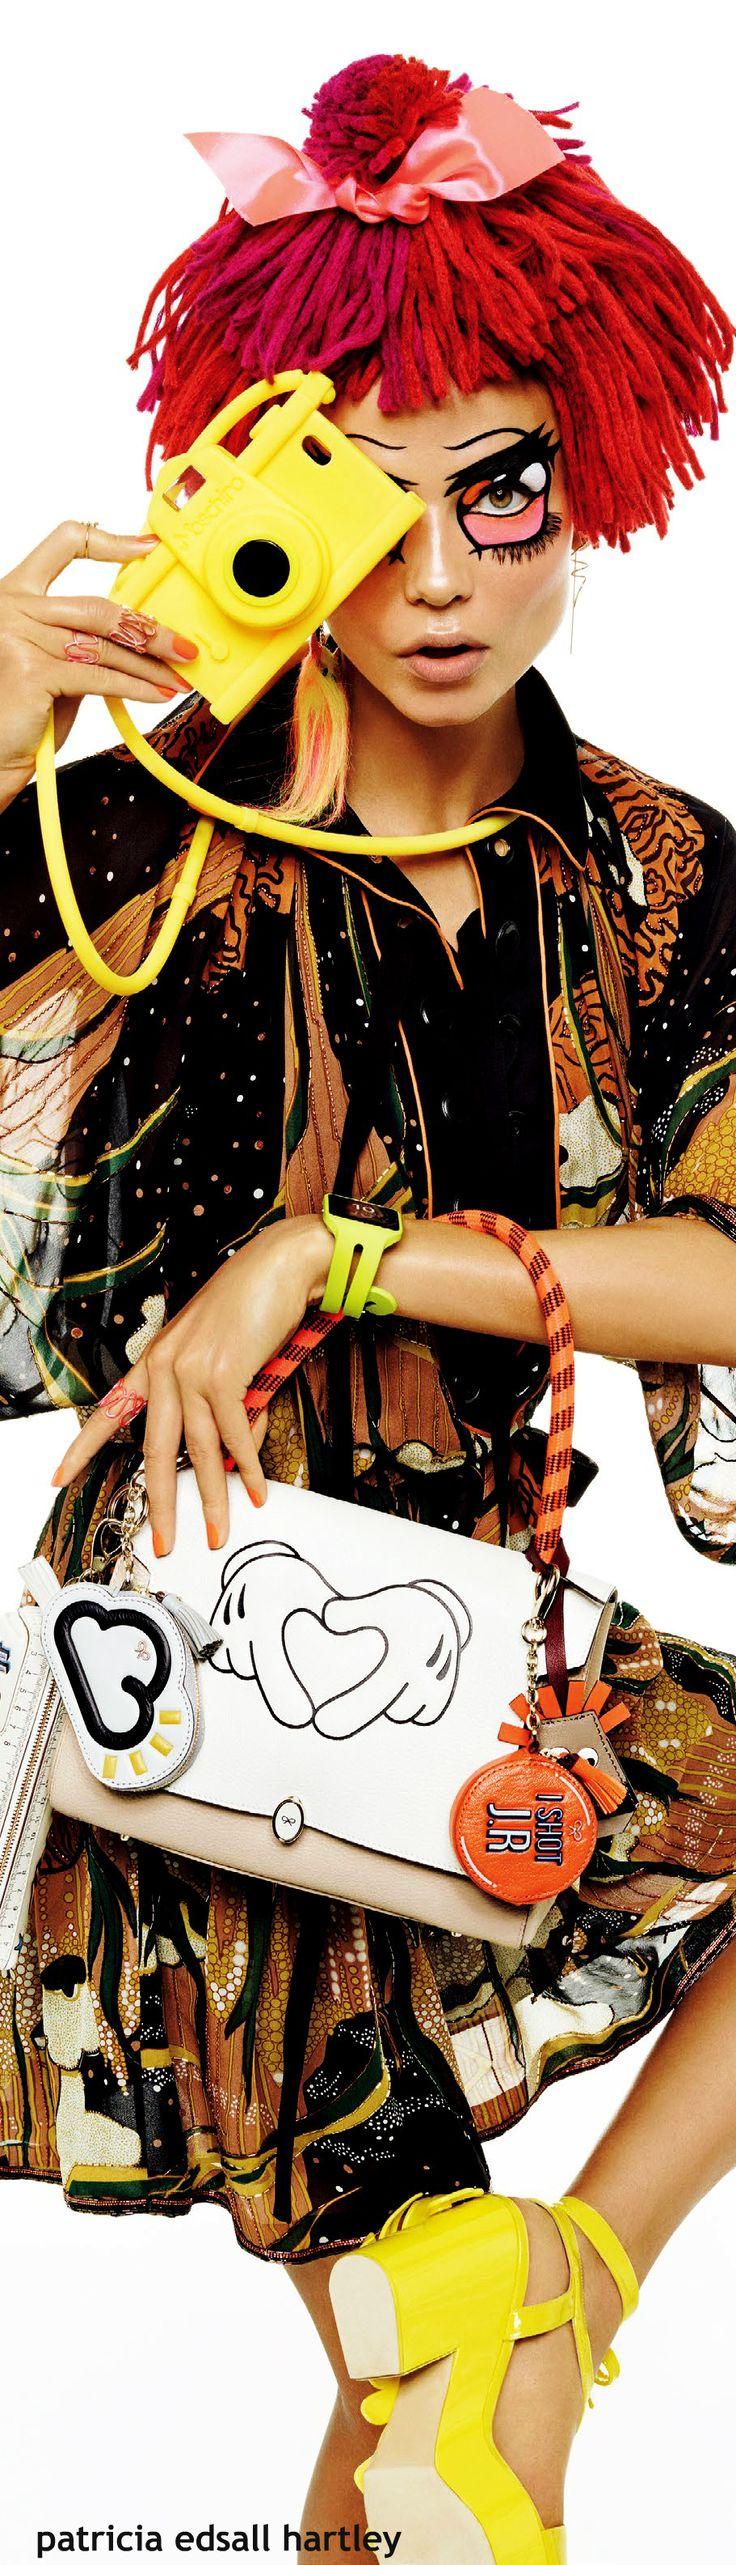 Natasha Poly for Vogue Japan - March 2015